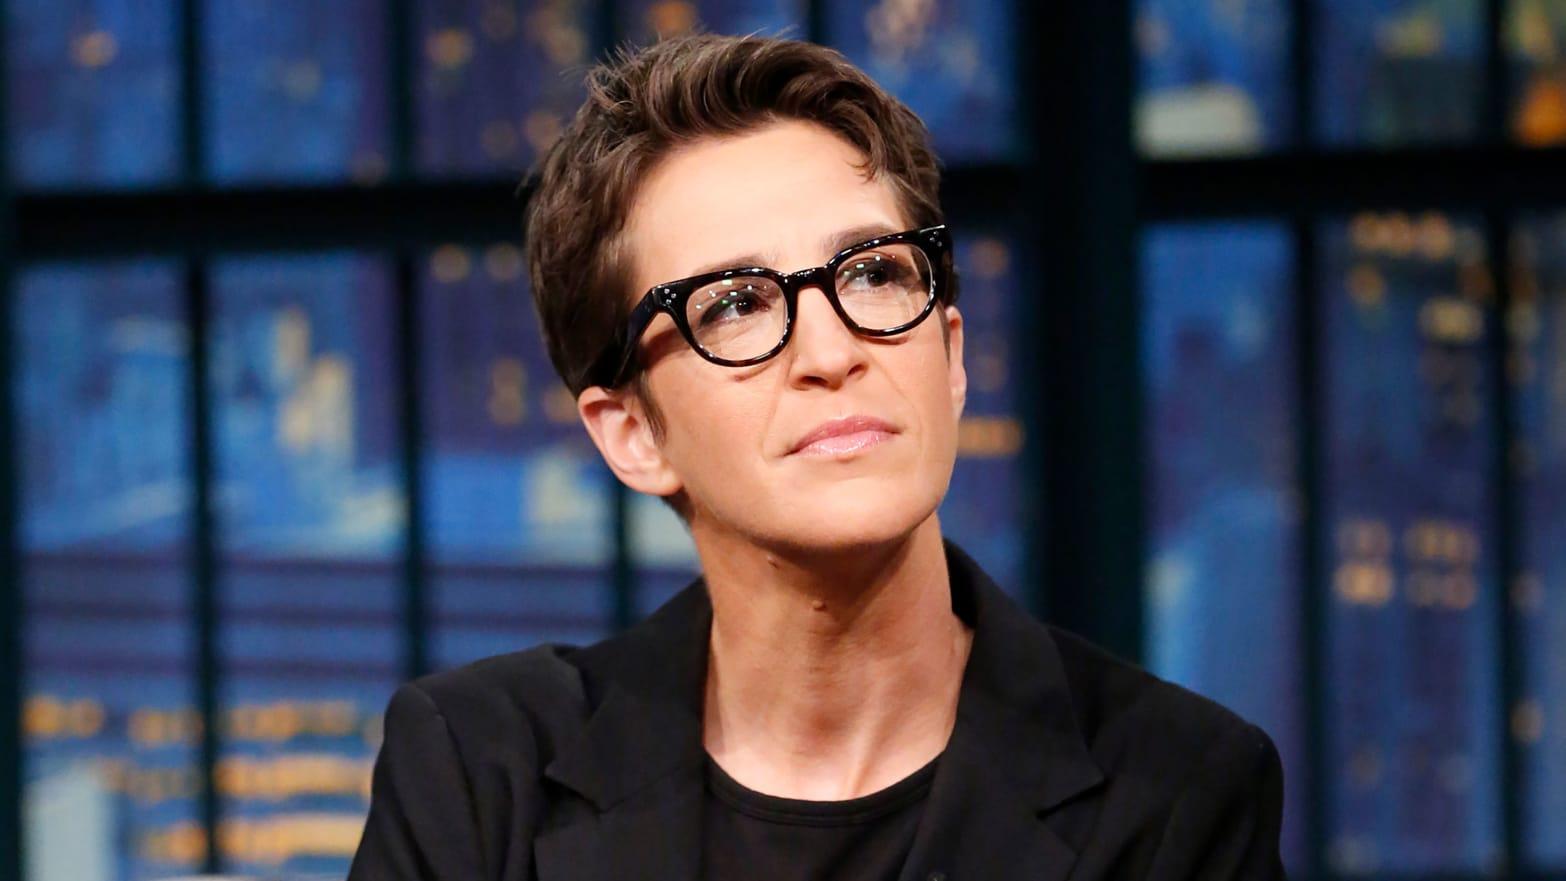 Why is Rachel Maddow leaving MSNBC